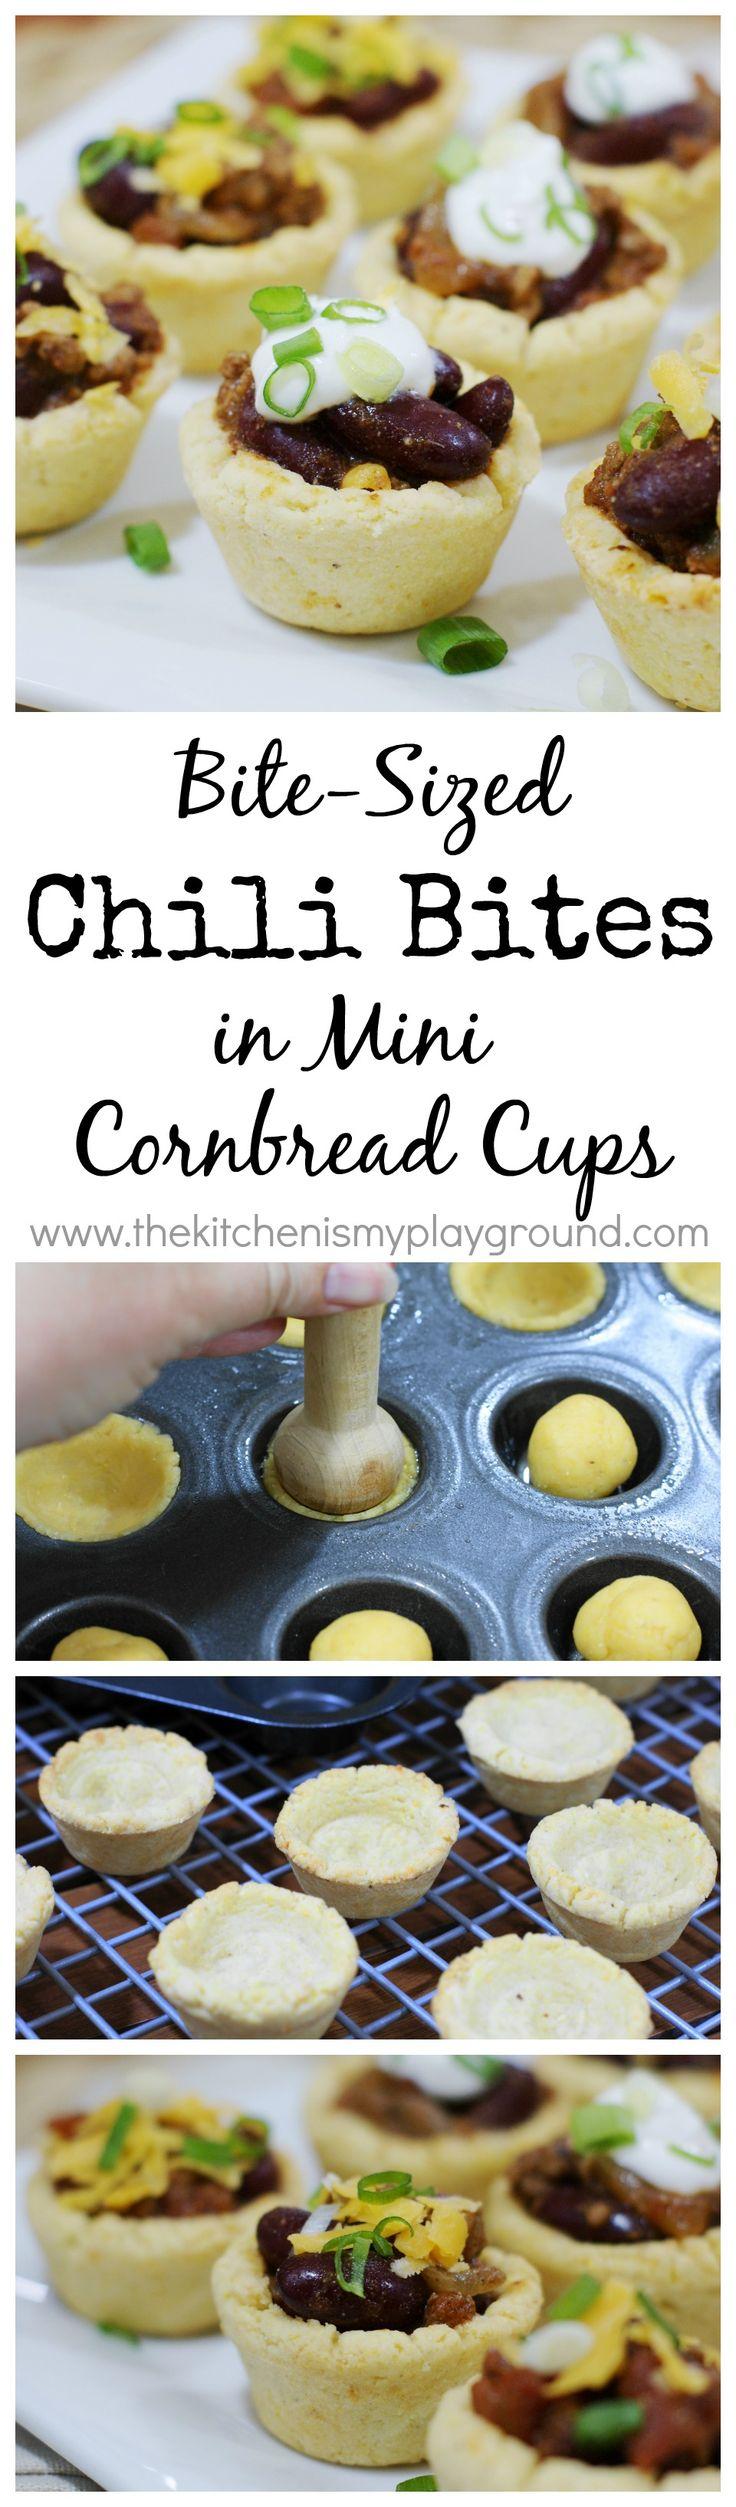 Chili Bites in Mini Cornbread Cups ~ turn chili into finger food with these tasty little chili cups.   www.thekitchenismyplayground.com